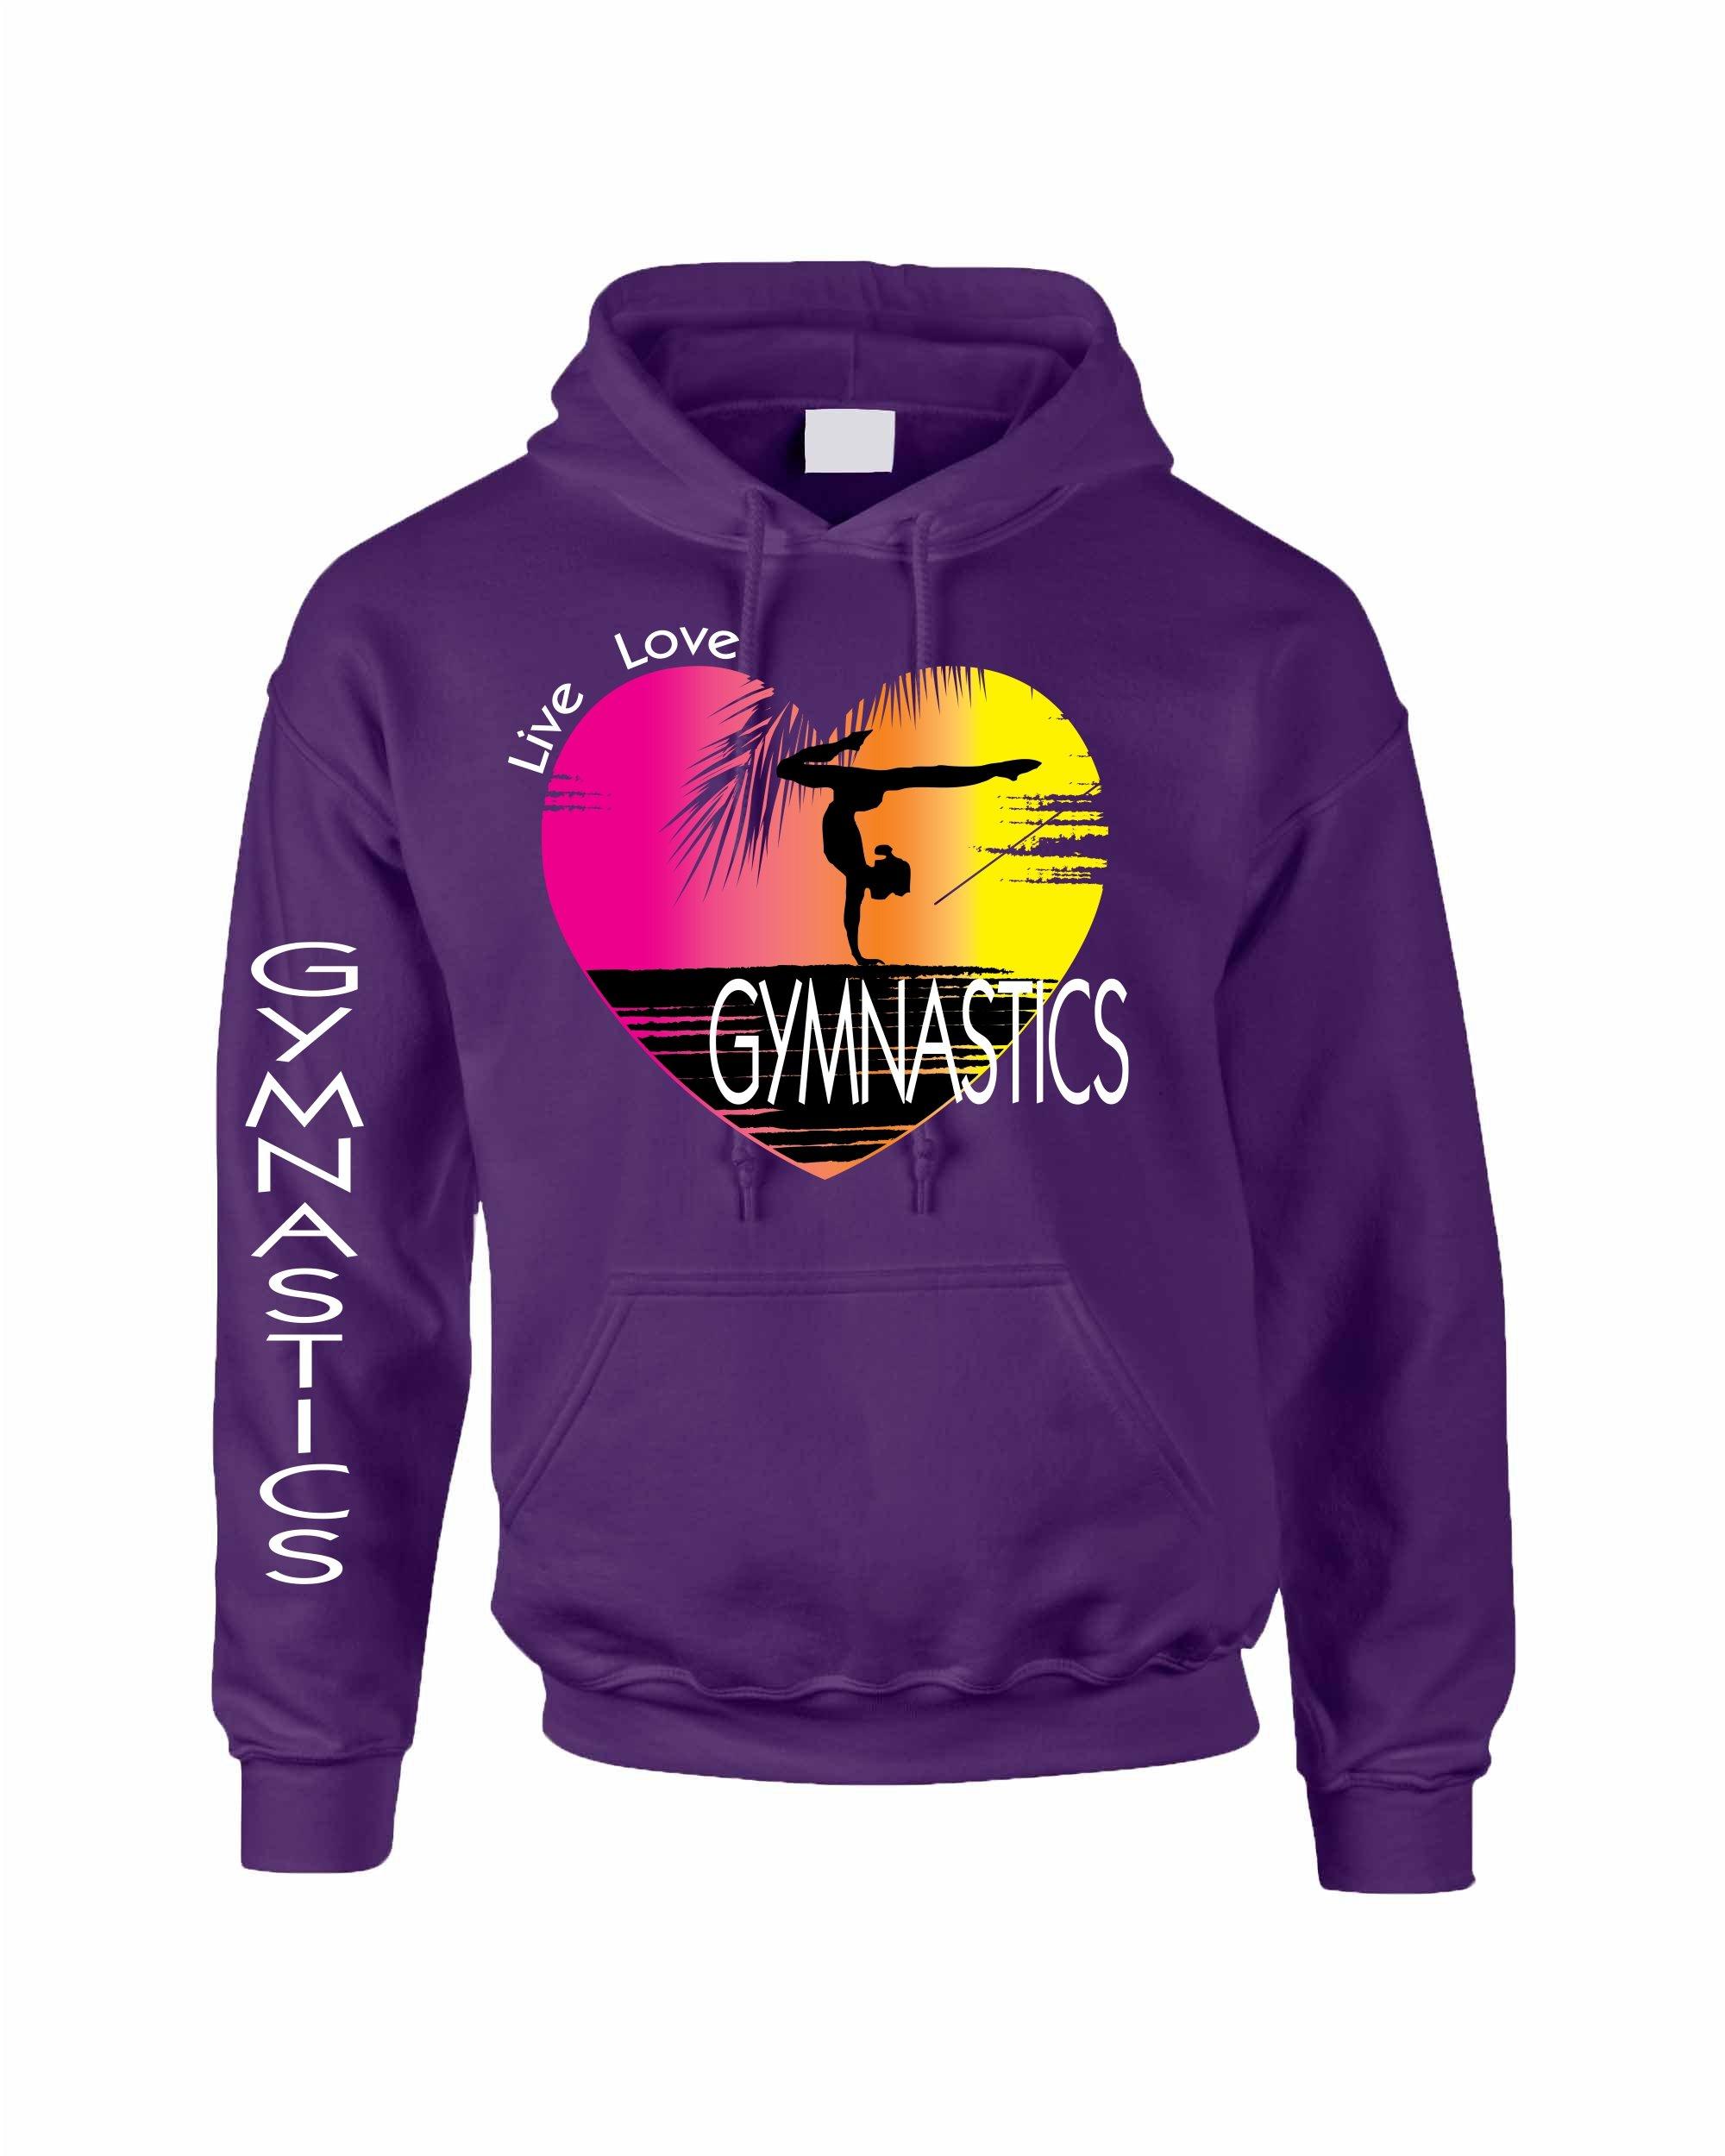 Allntrends Adult Hoodie Sweatshirt Gymnastics Art Pink Print Love Live (M, Purple Rush)